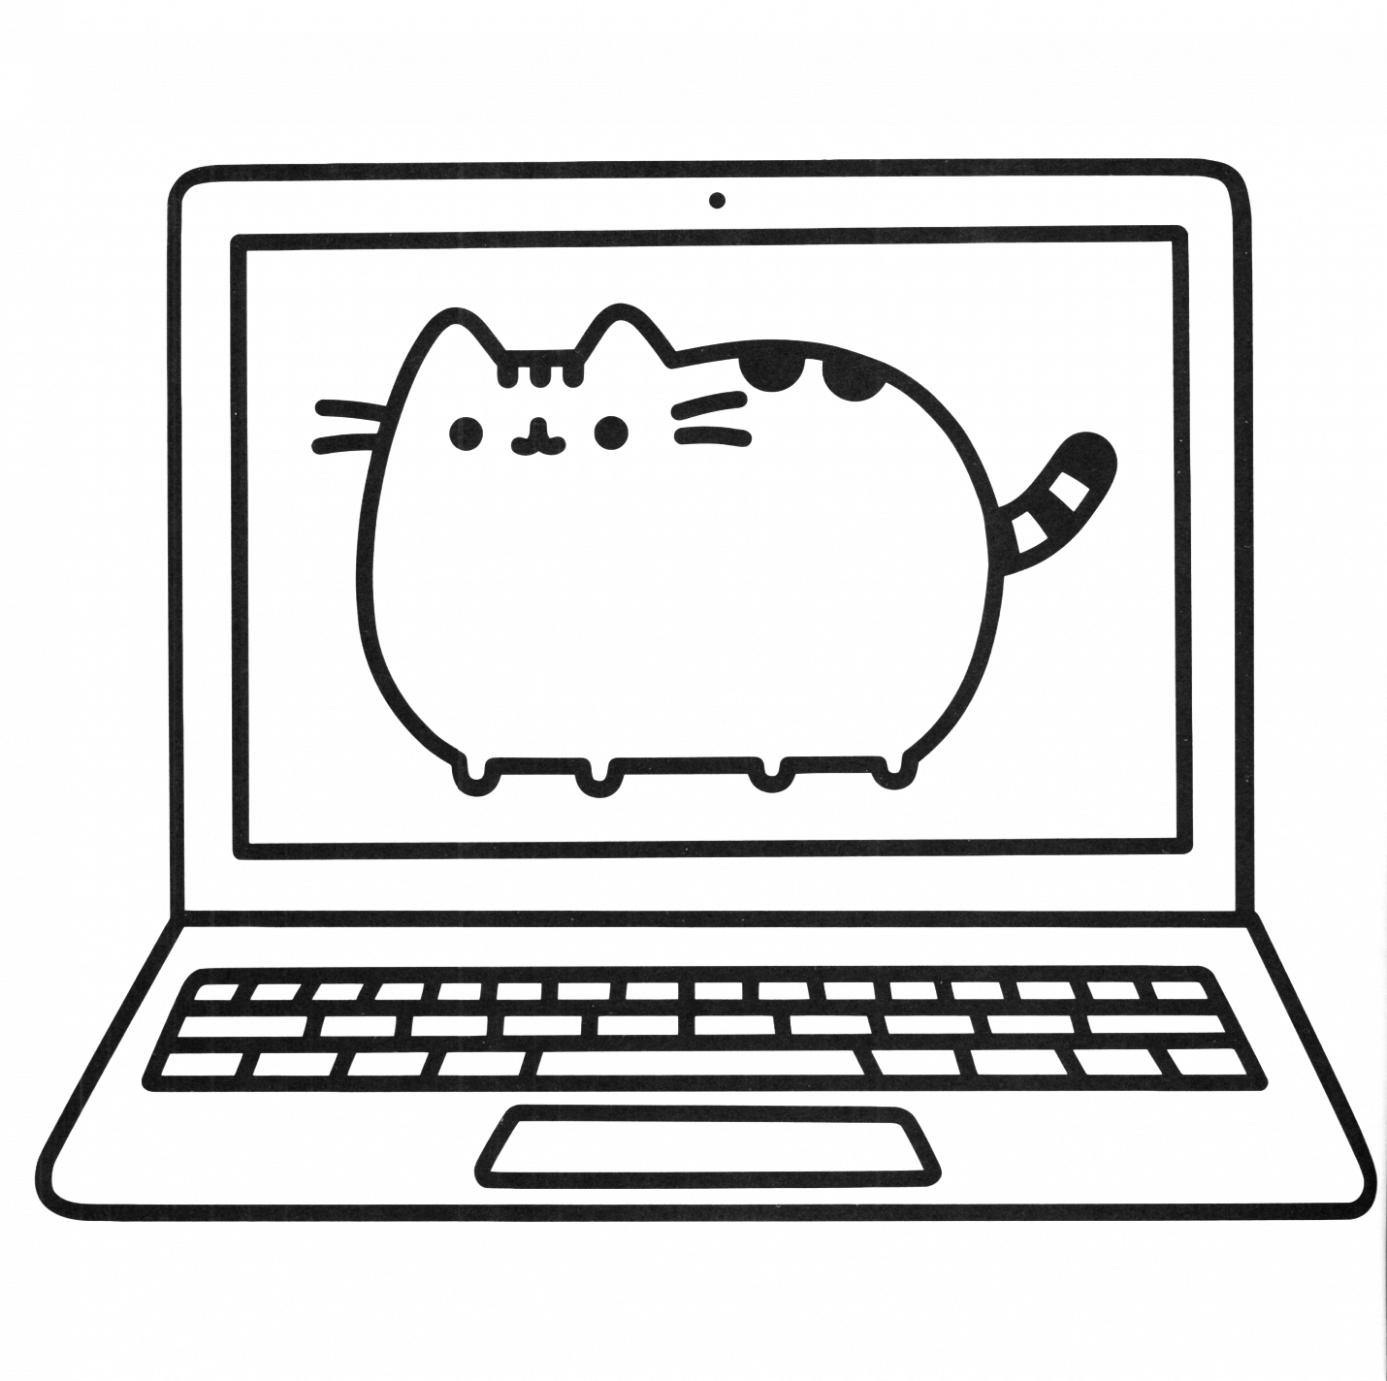 Kolorowanka Kotka Pusheen W Laptopie Kolorowanki Pusheen Gifyagusi Pl